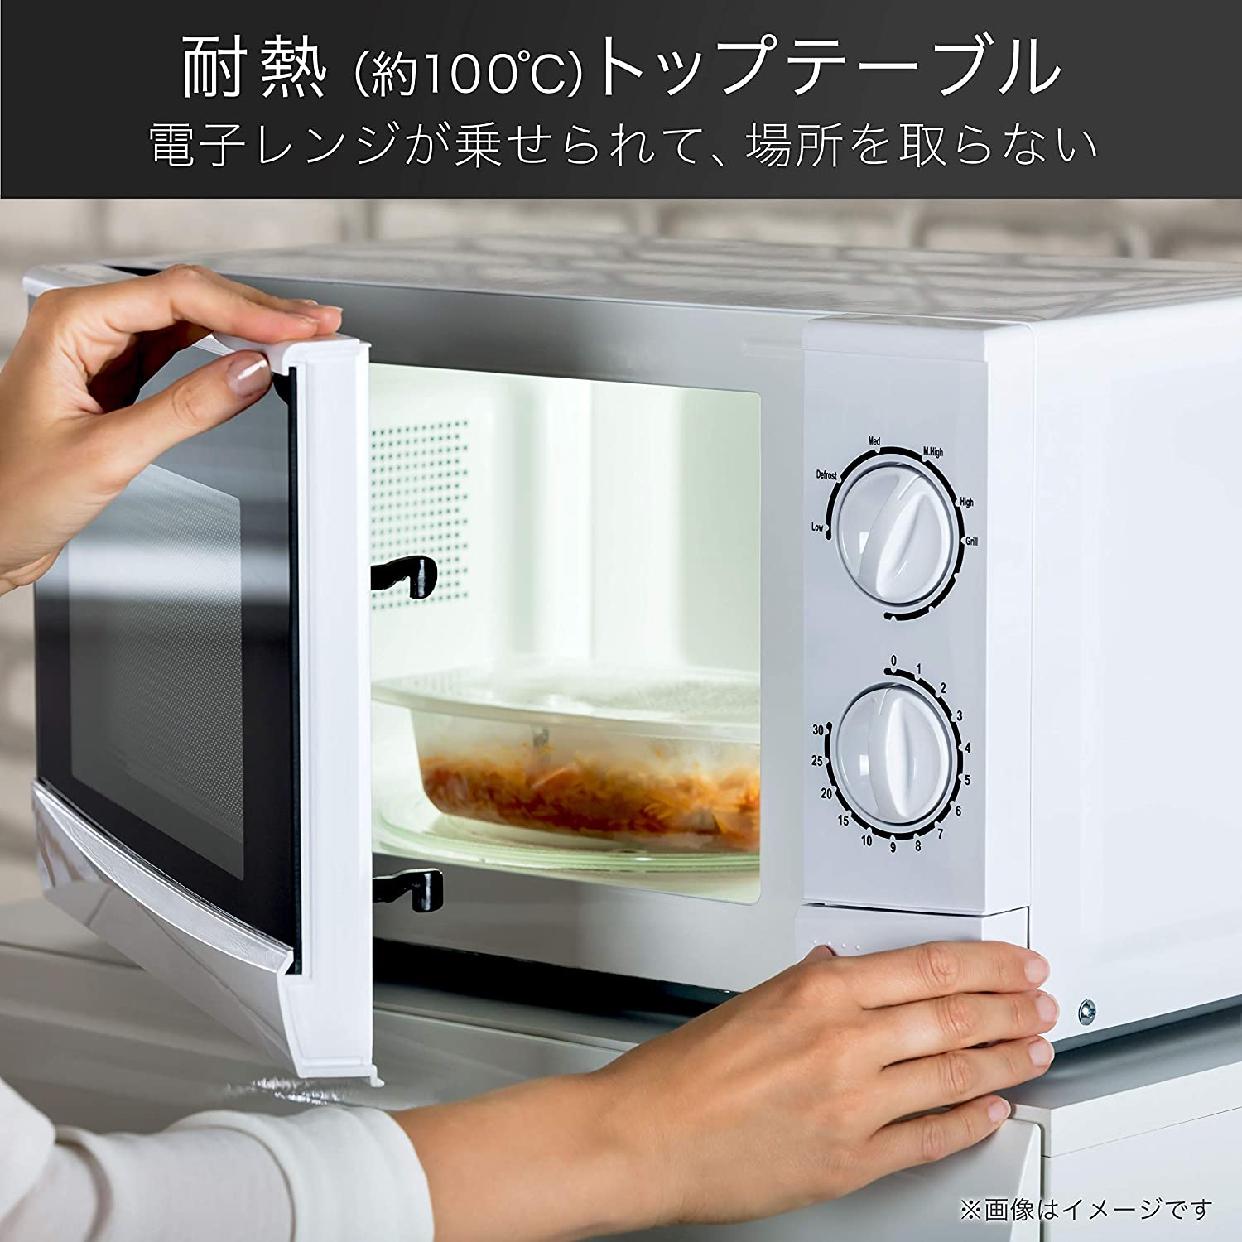 Hisense(ハイセンス)93L 冷凍冷蔵庫 HR-B95Aの商品画像4